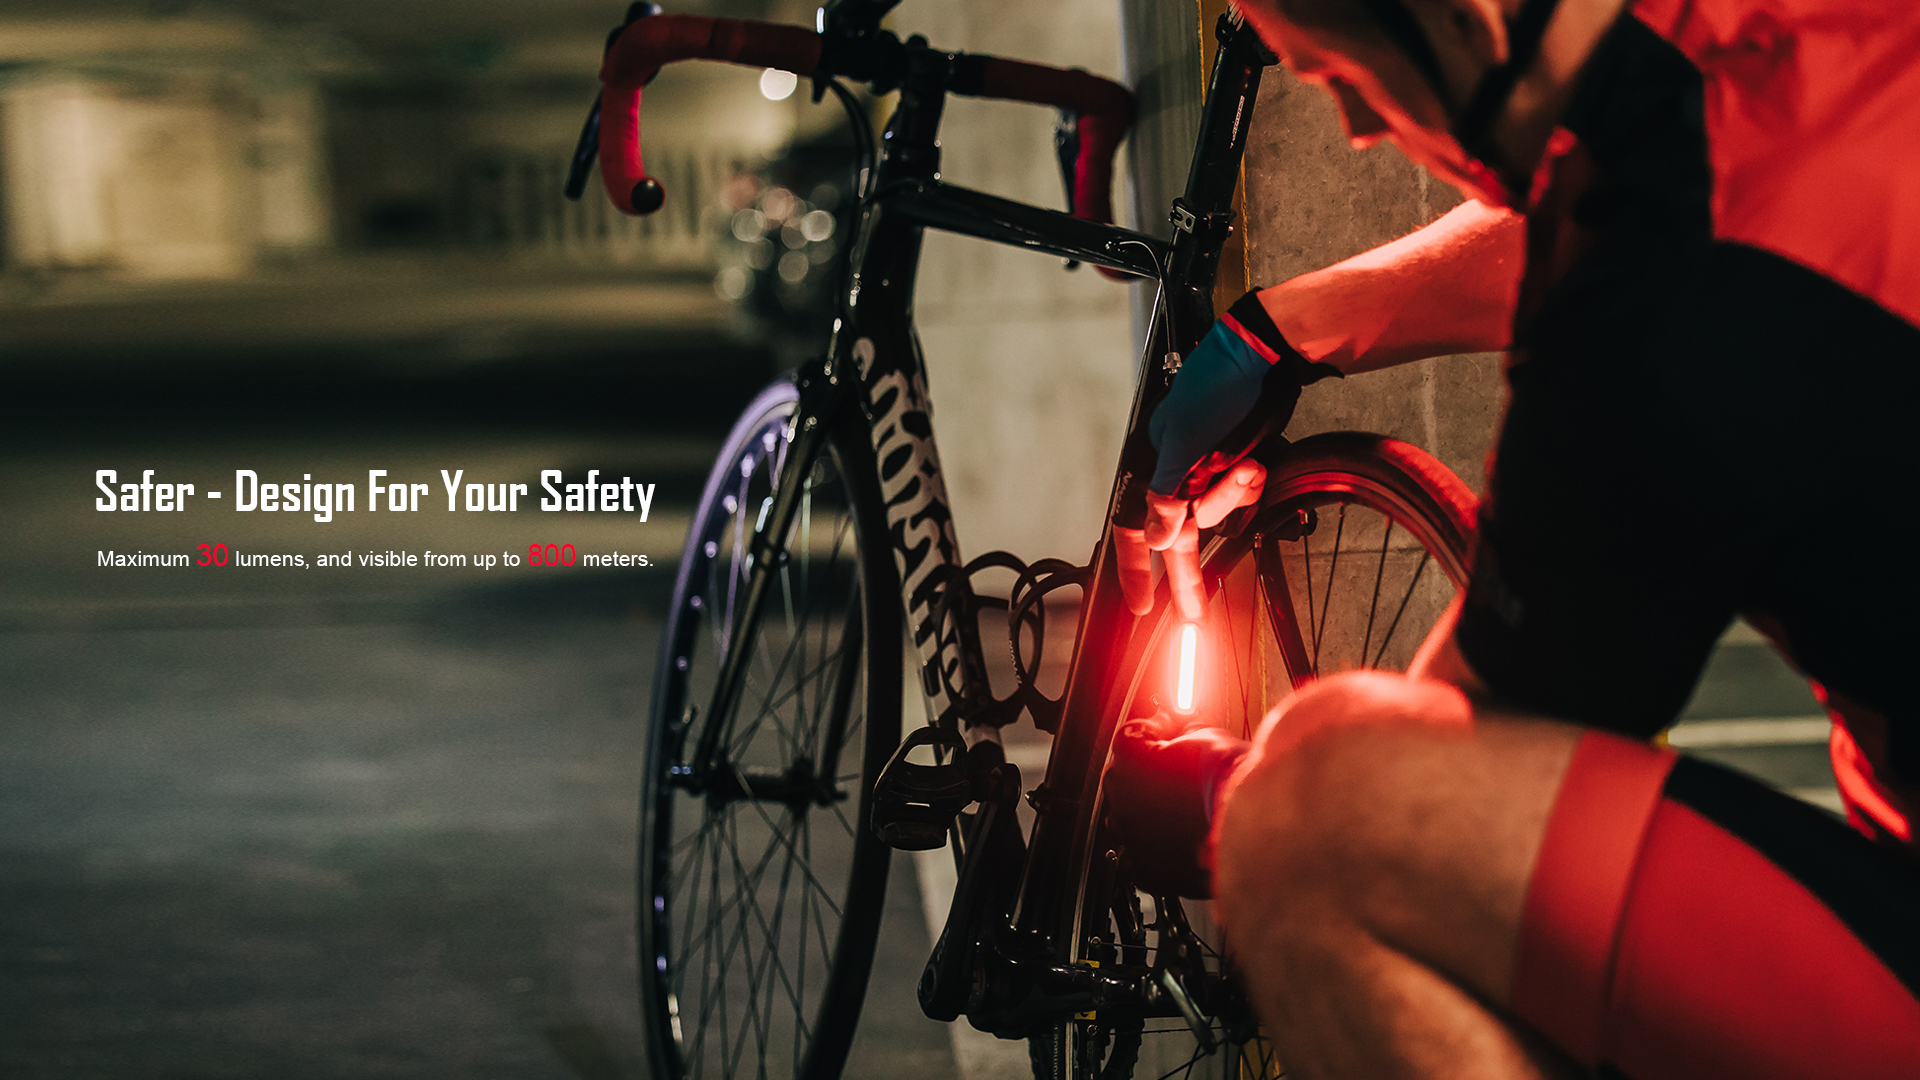 Seemee 30 TL Rear Bike Light Safer